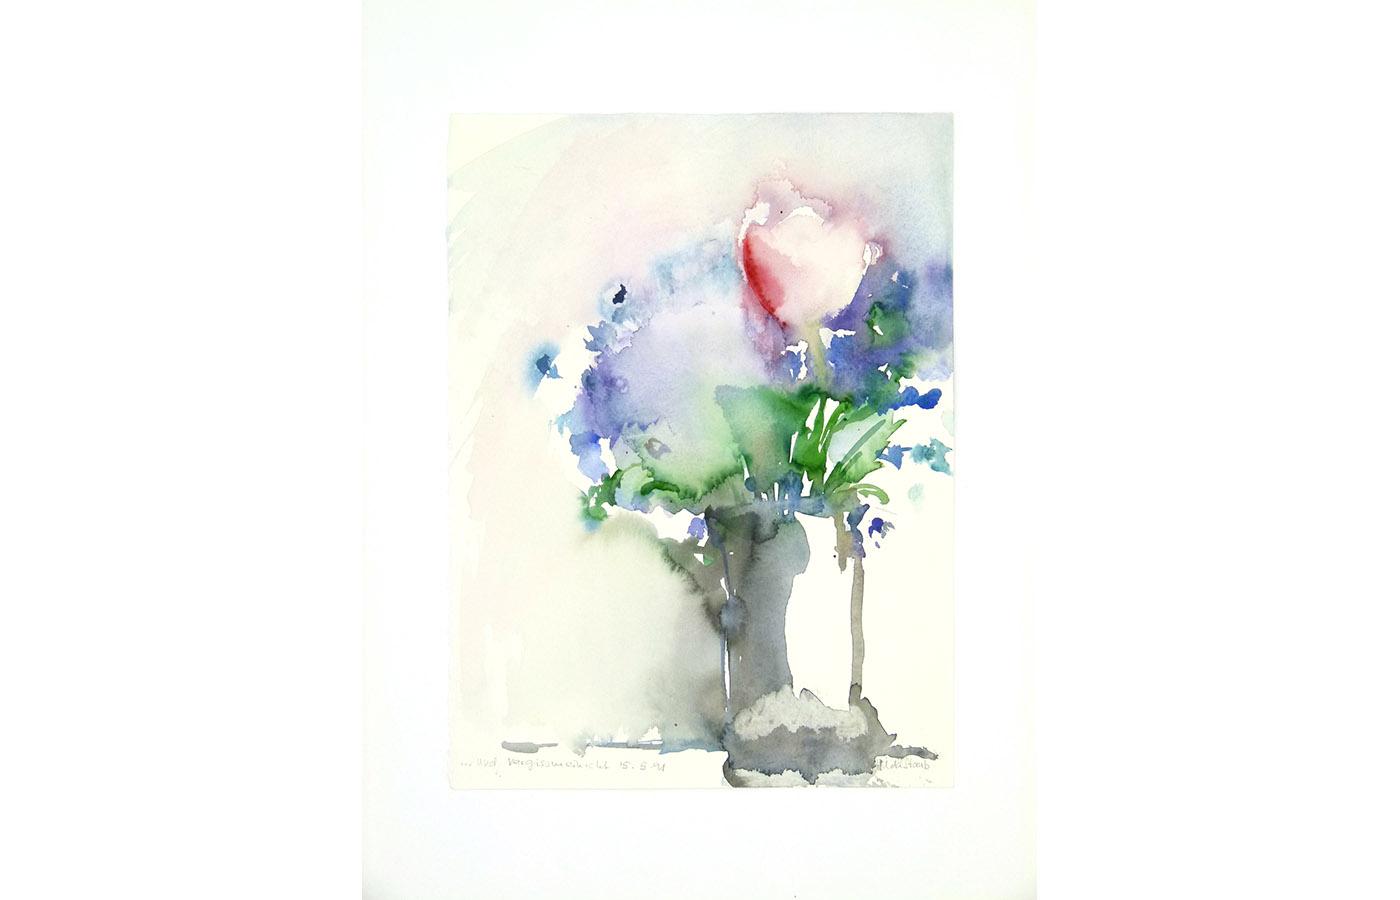 Blumen_0074_L1100471a